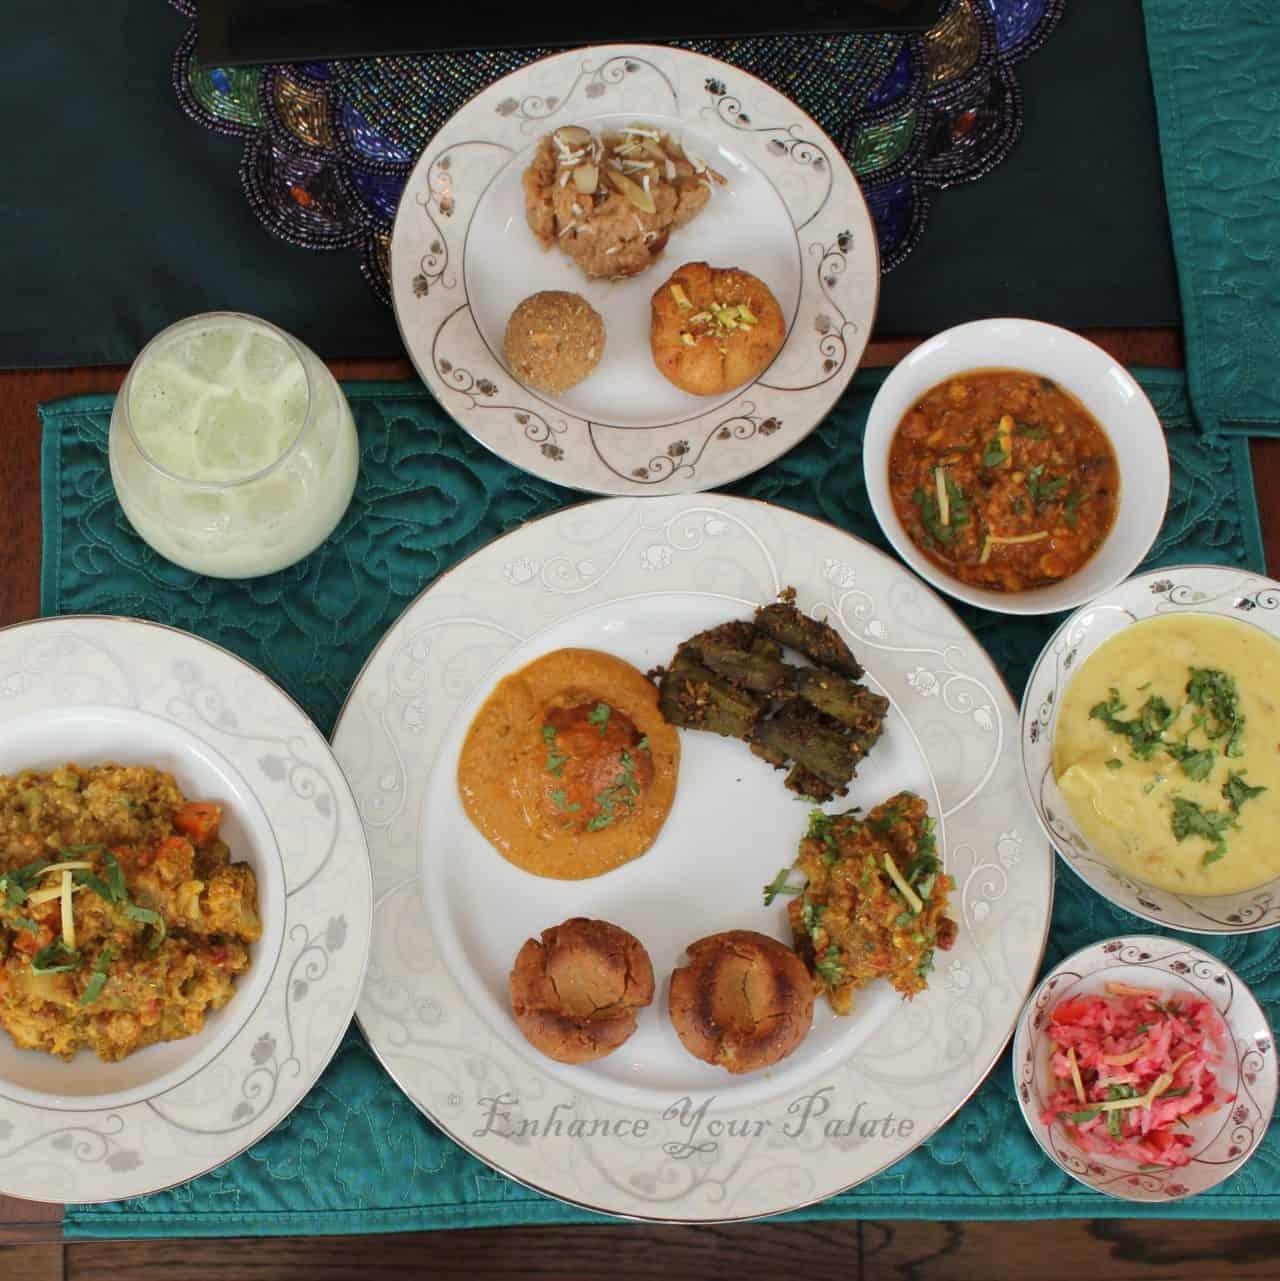 dal bati churma plate setting with other popular accompaniments